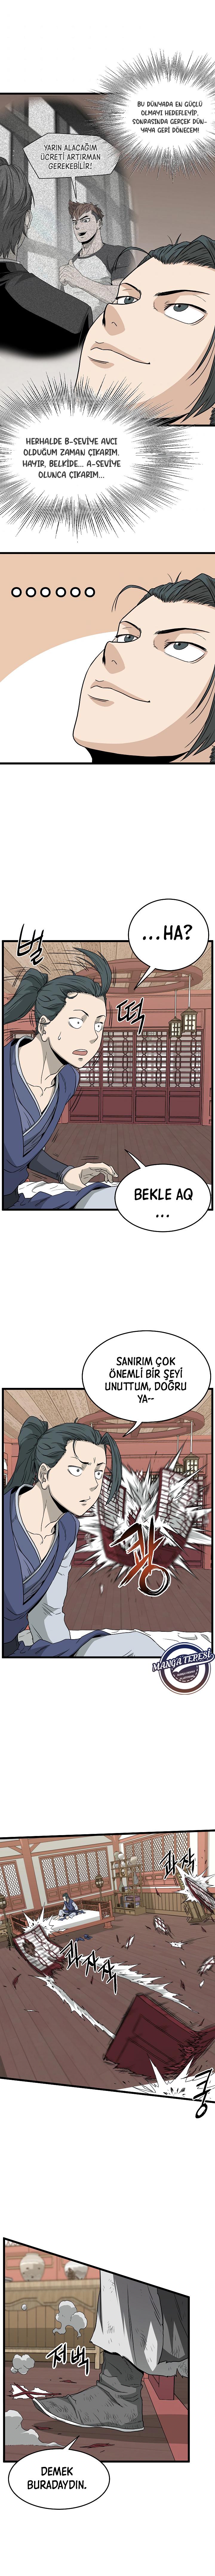 murim-login59-bolum